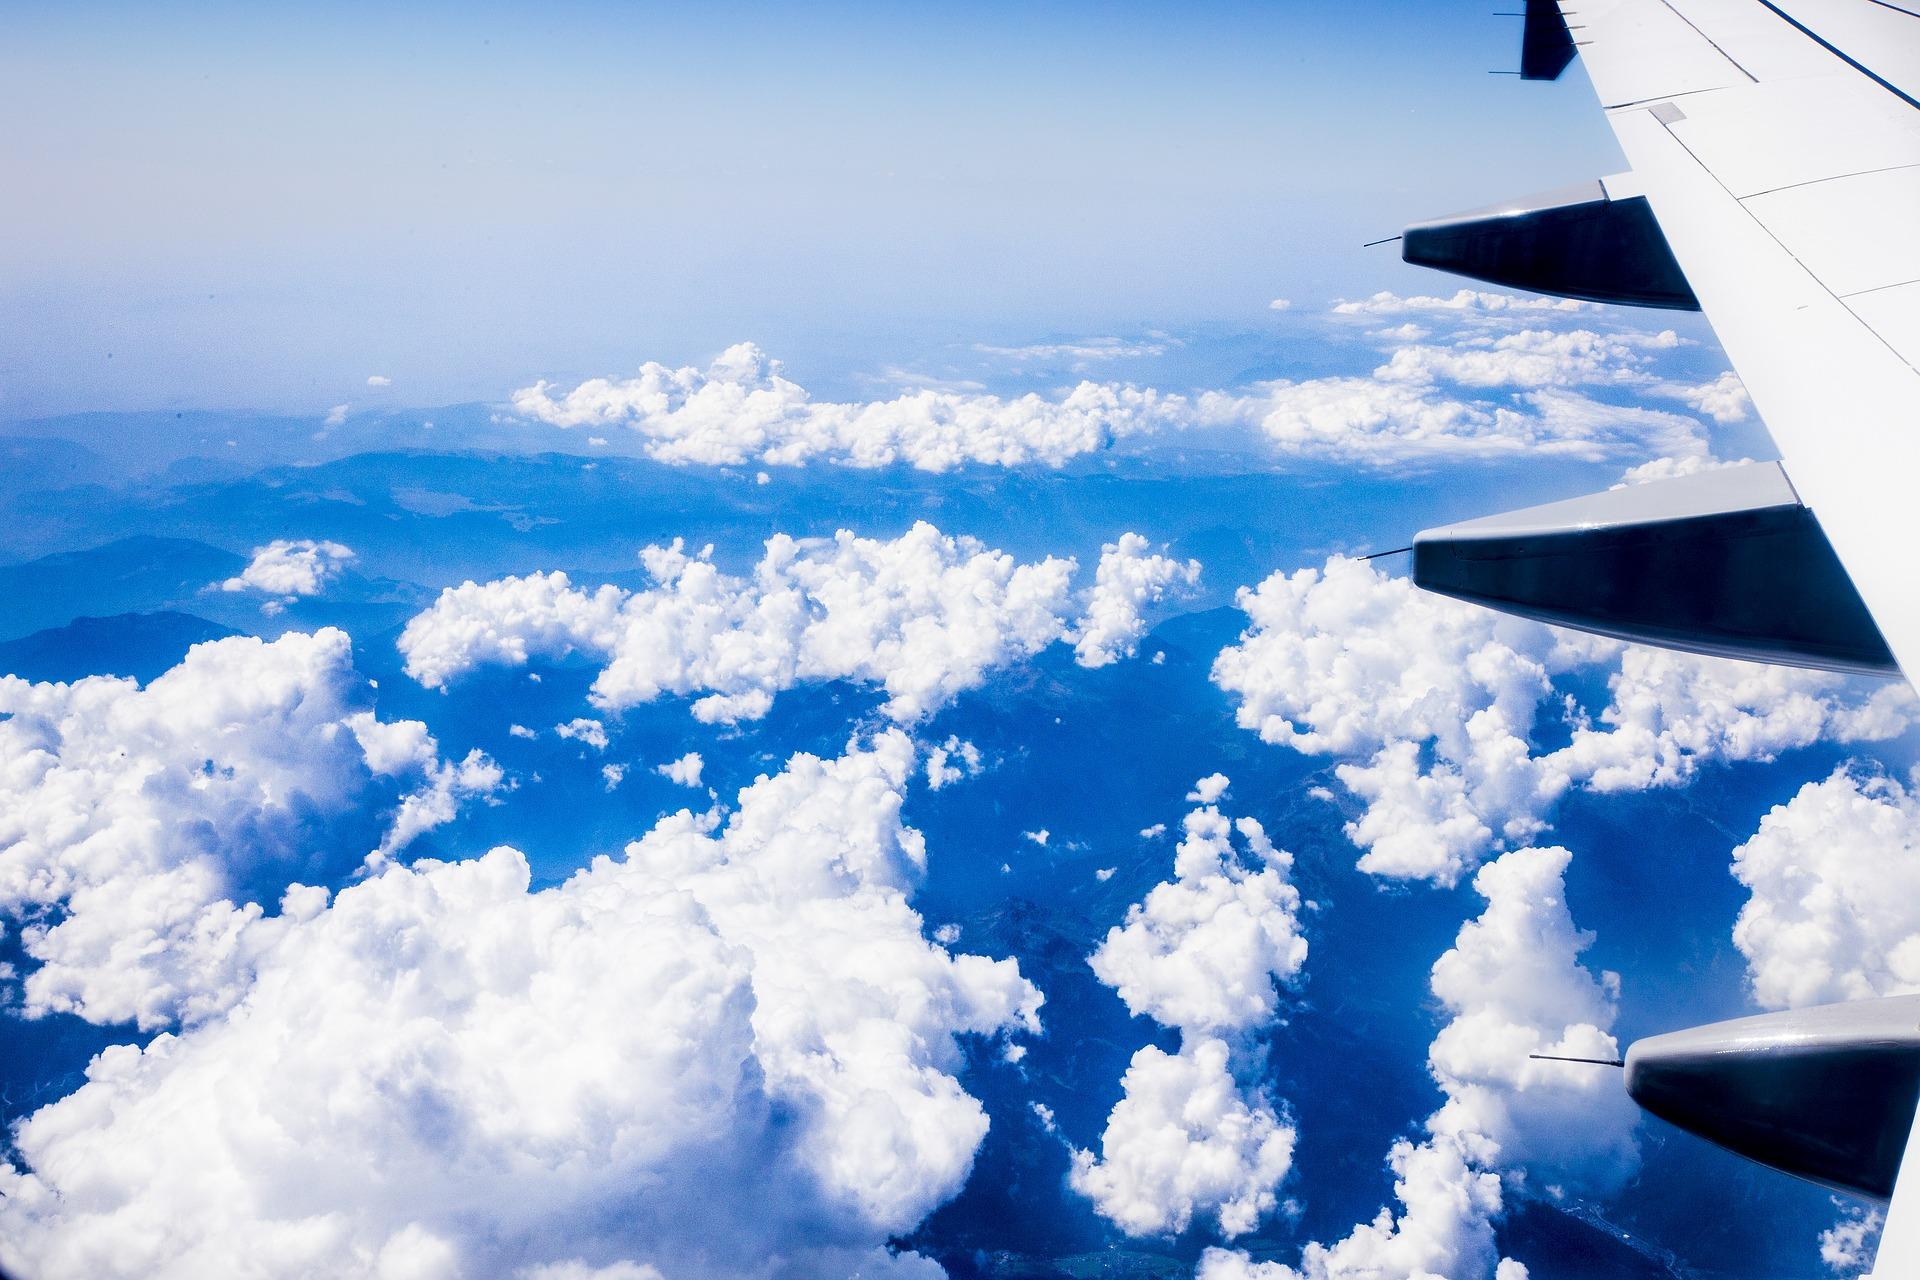 дело человек в небе фото с самолета парке острове